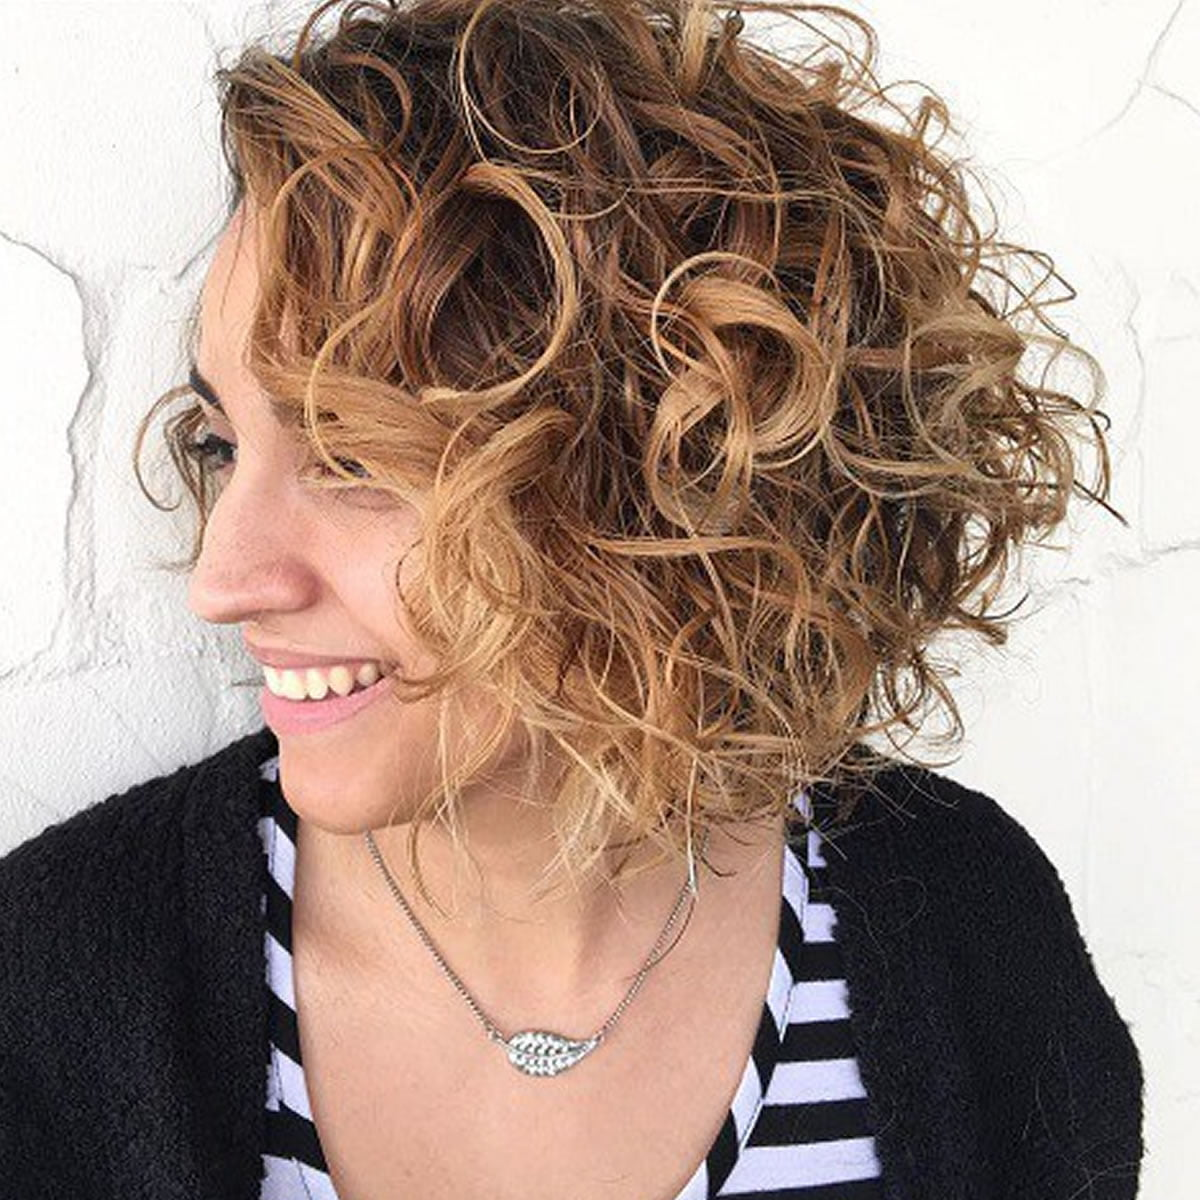 curly bob hairstyles for women autumn & winter short hair 2017